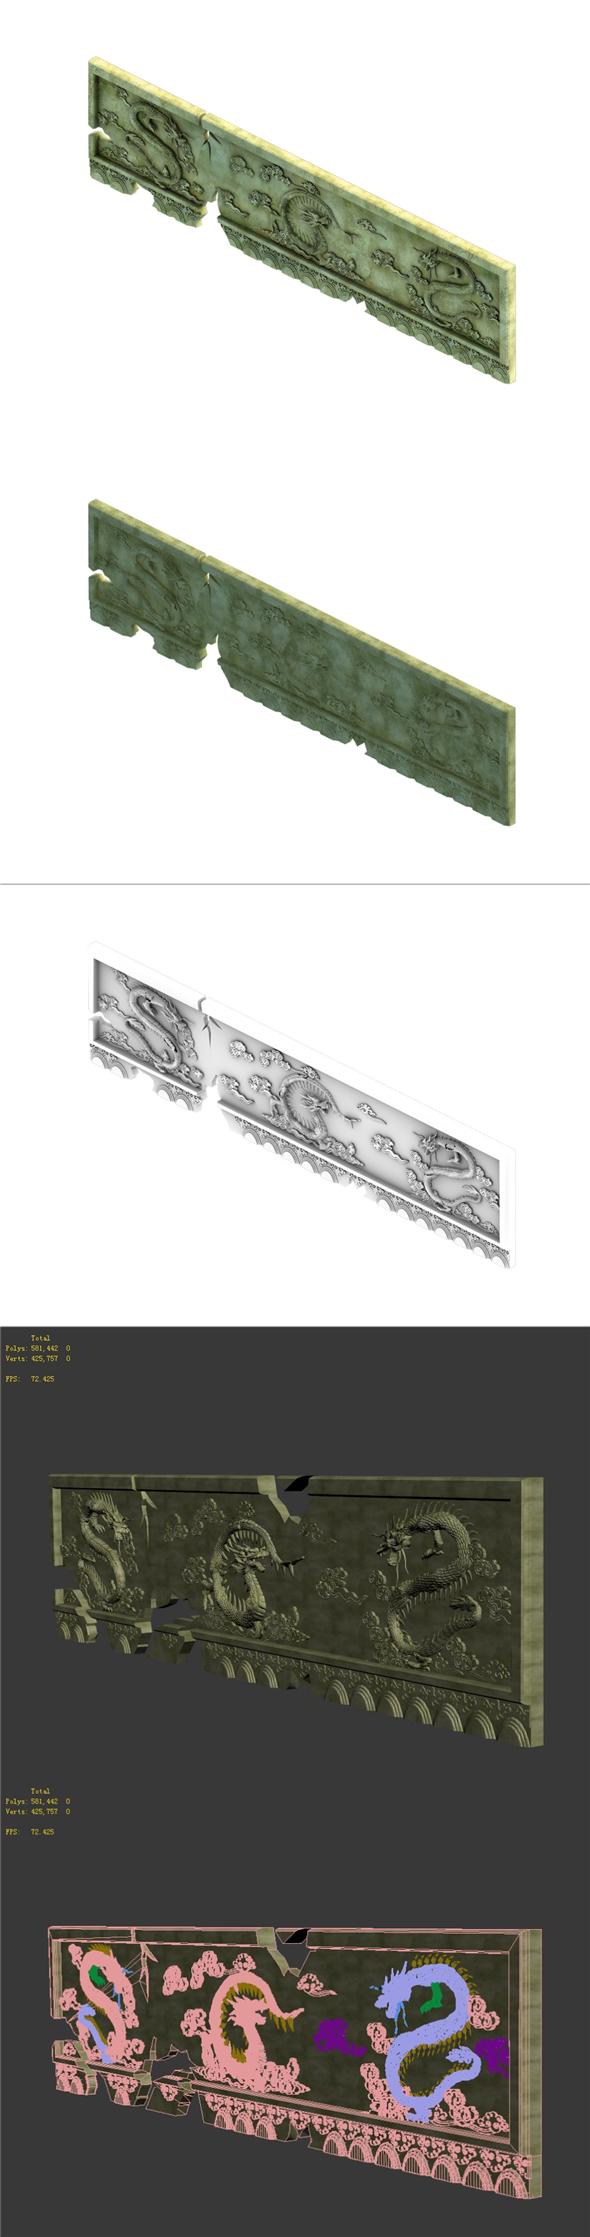 Residual stone carvings - dragon - 3DOcean Item for Sale